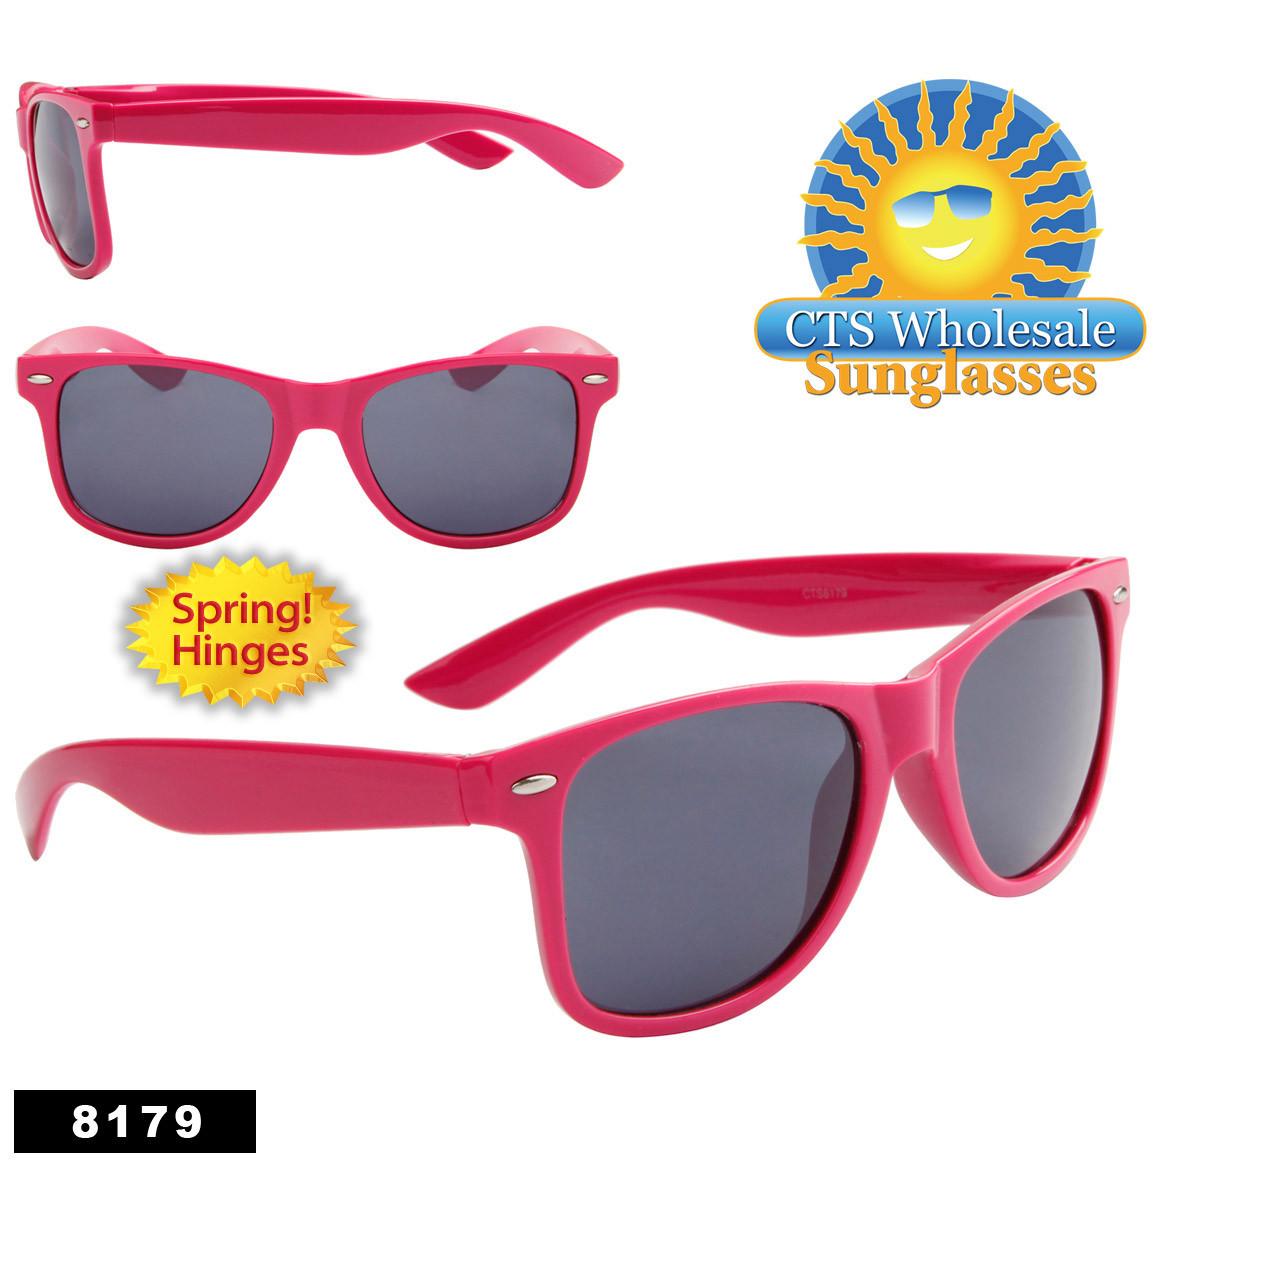 Magenta California Classics Sunglasses by the Dozen - Style # 8179 Spring Hinge